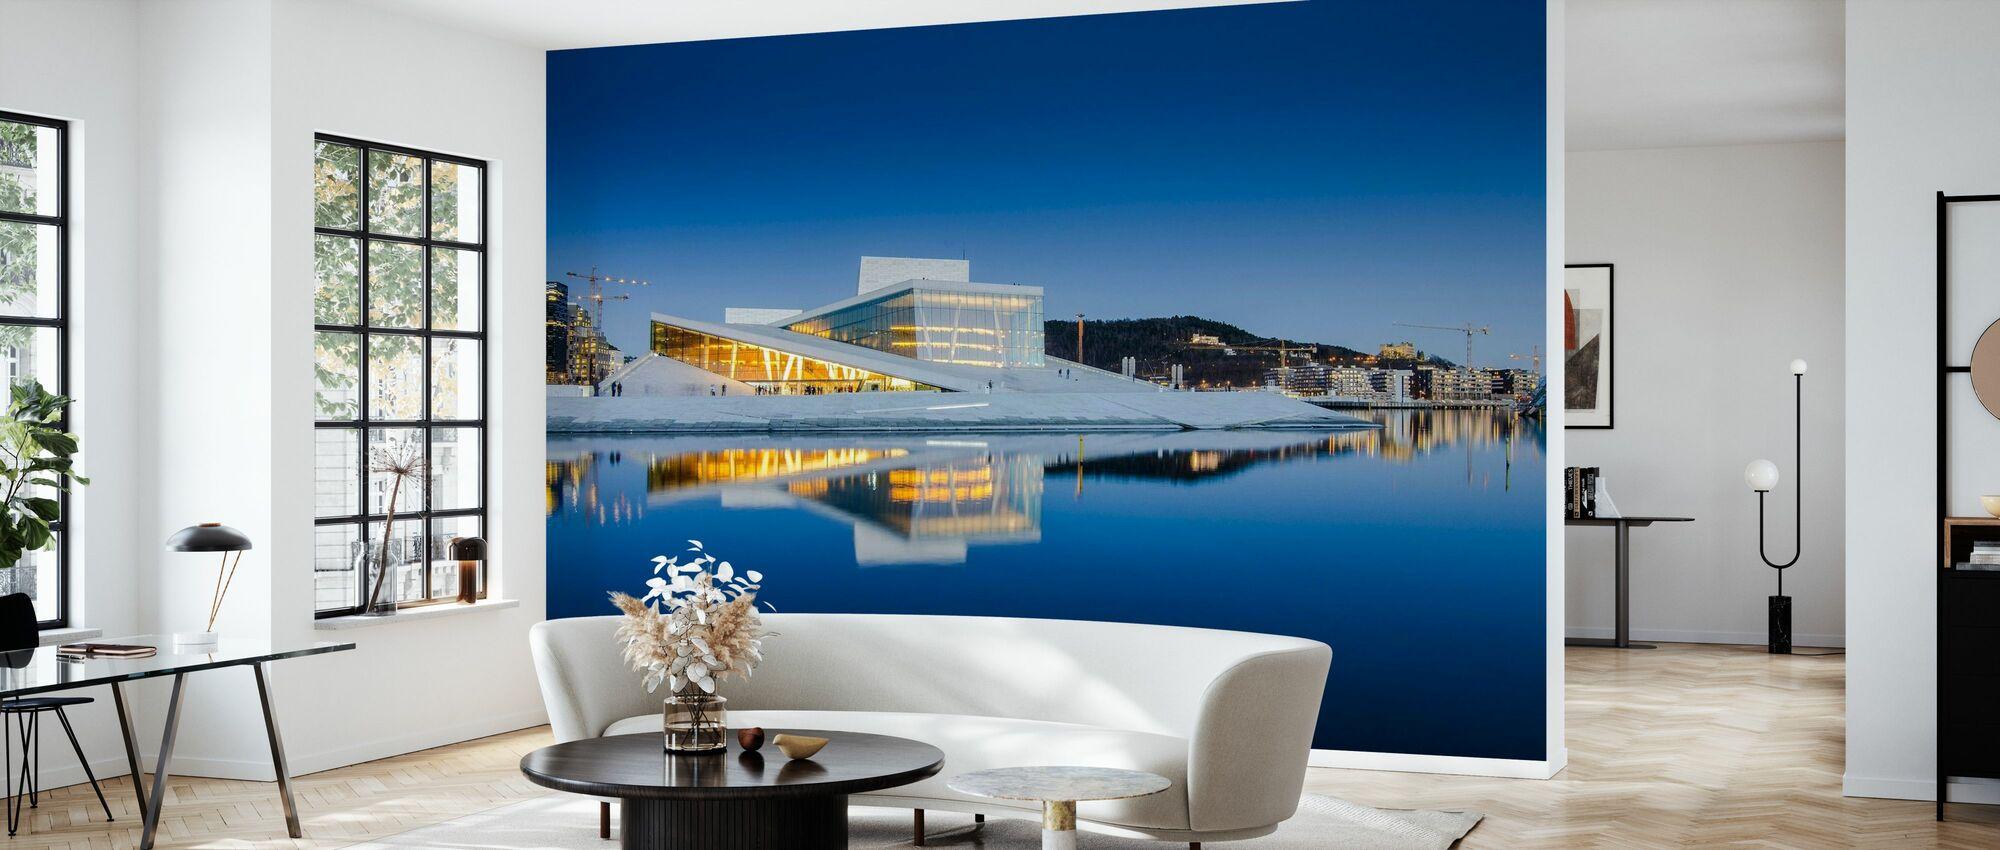 Oslo Opera House bij nacht - Behang - Woonkamer